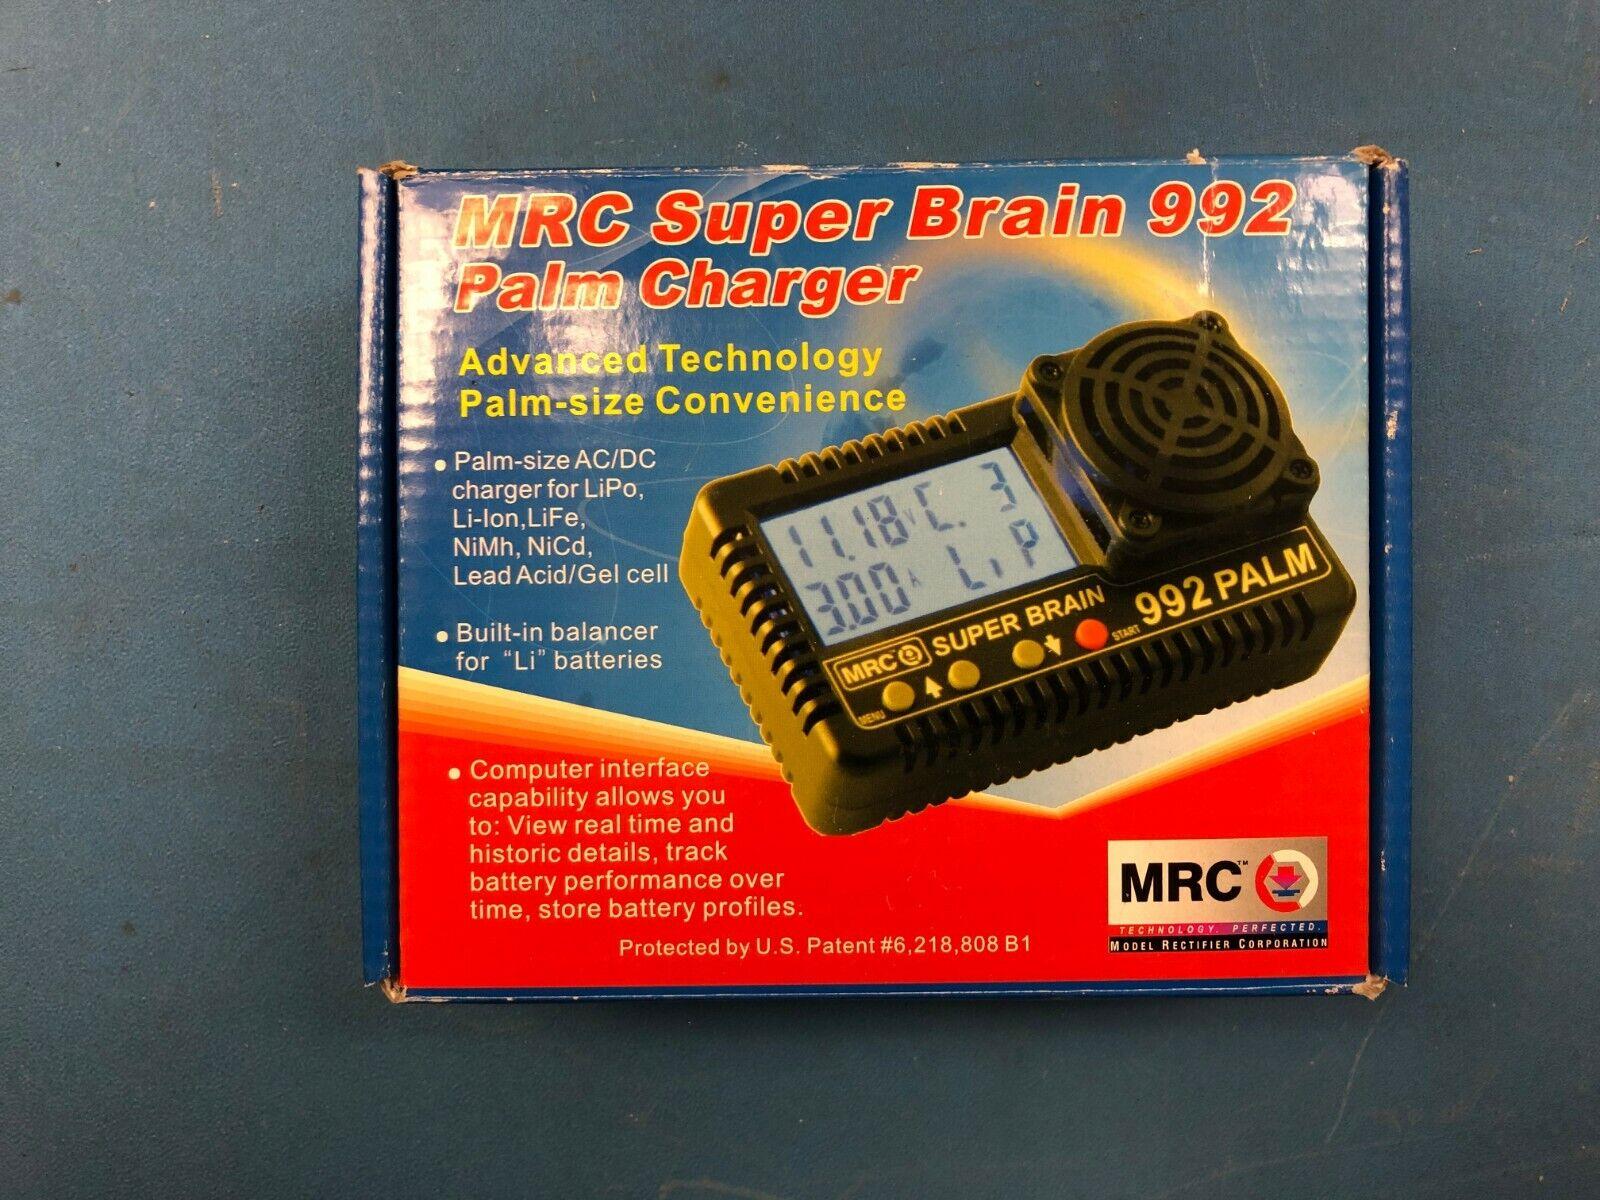 MRC 992 Cargador De Palma Super cerebro